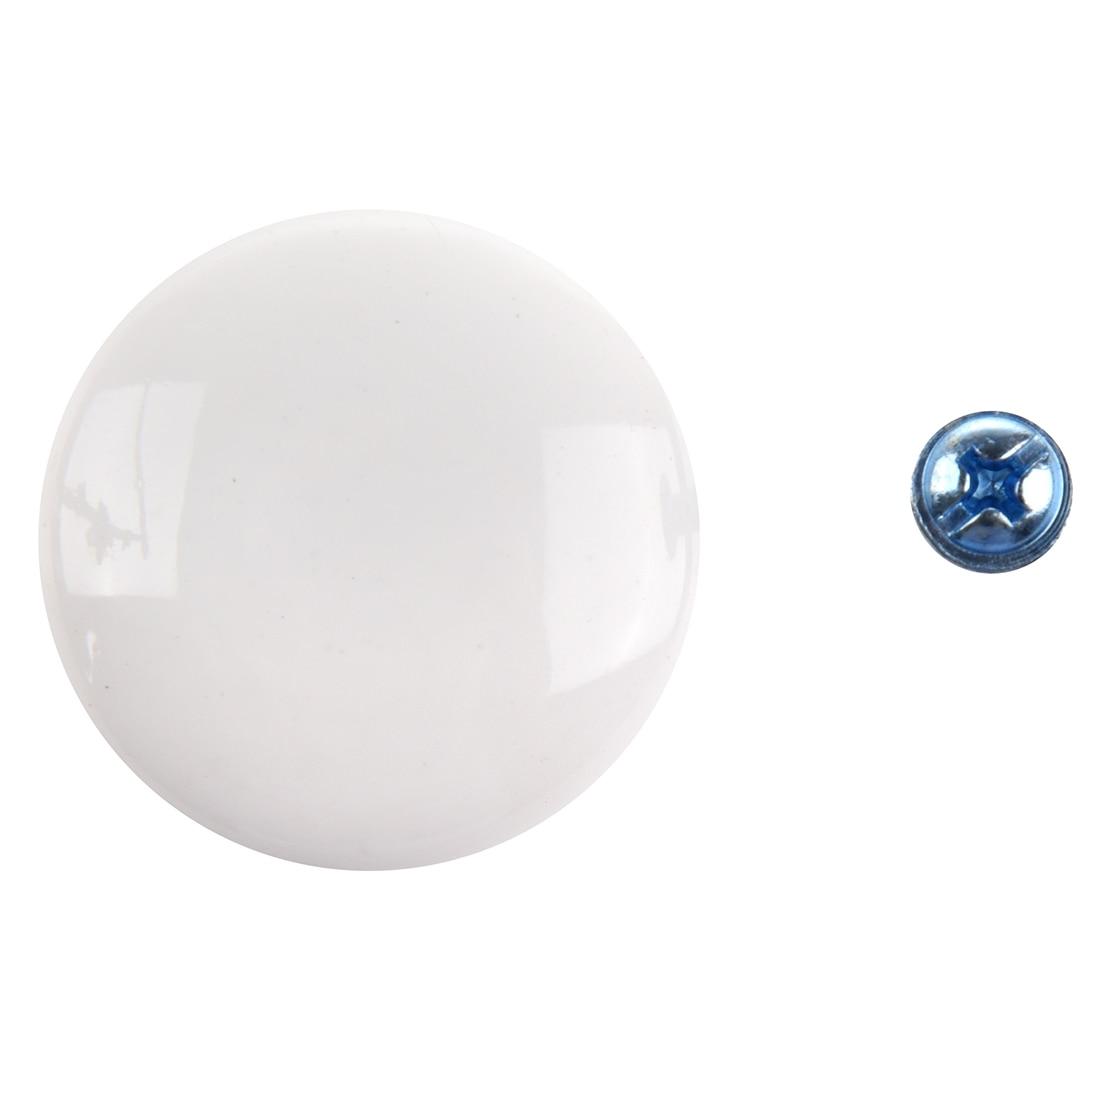 2pcs White Round Ceramic Cupboard Knob Drawer Cabinet Pull Handle S